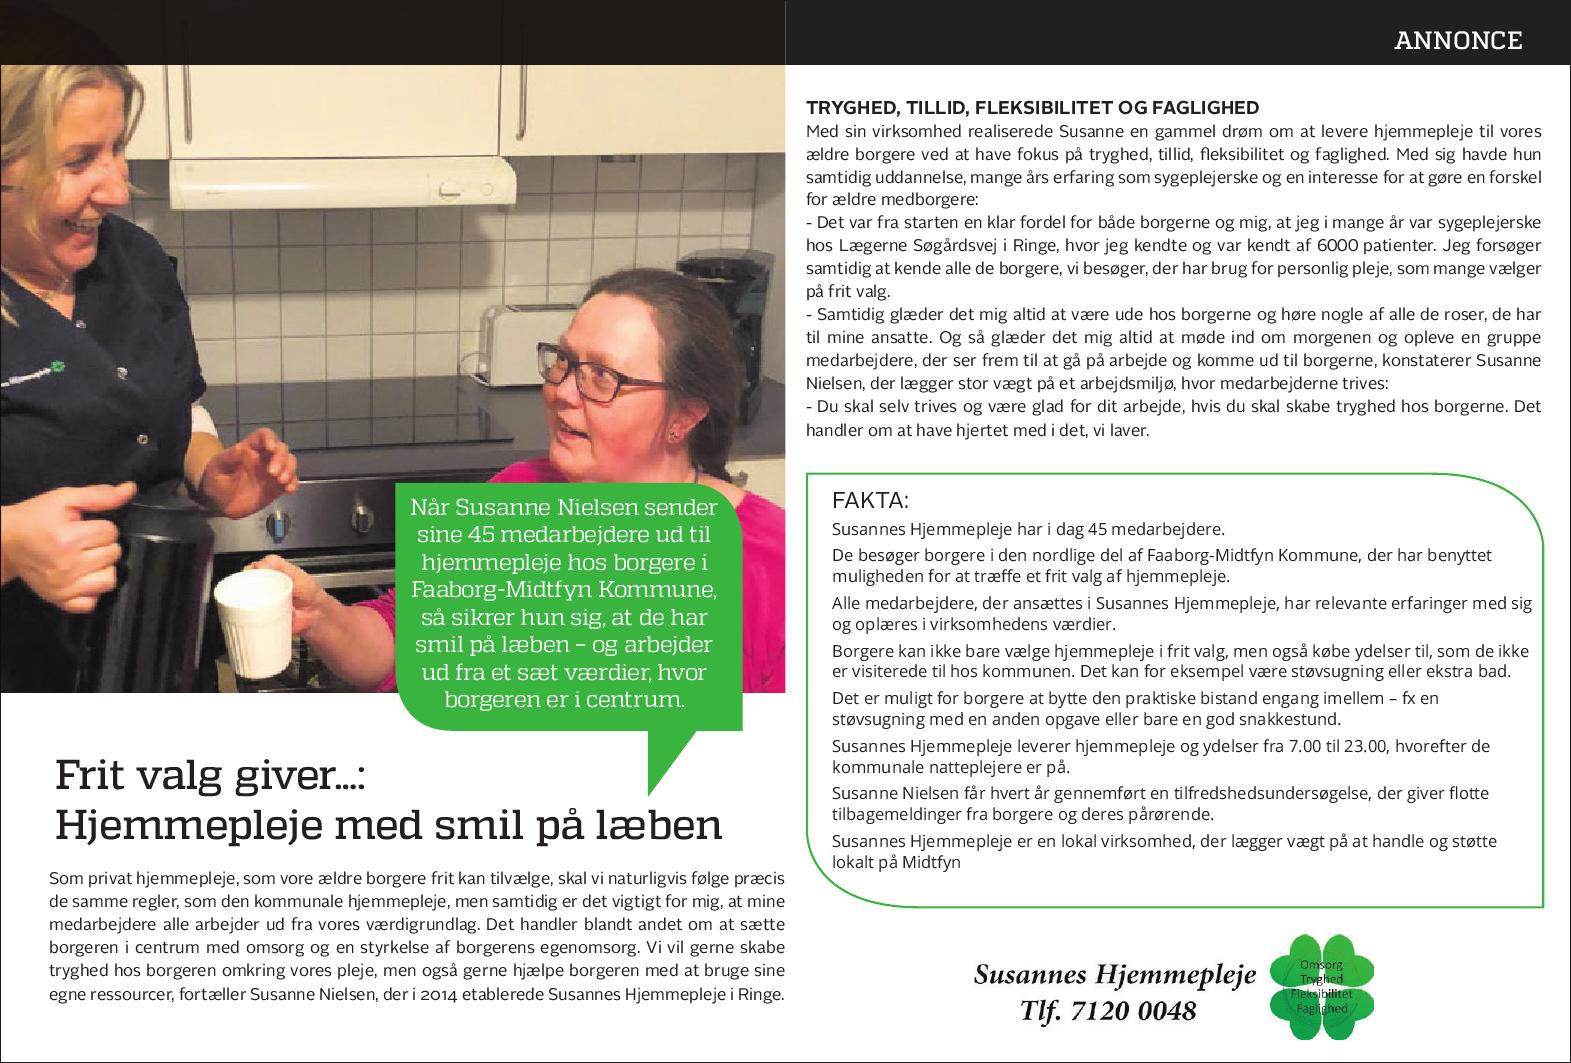 fåborg midtfyn kommune hjemmeplejen